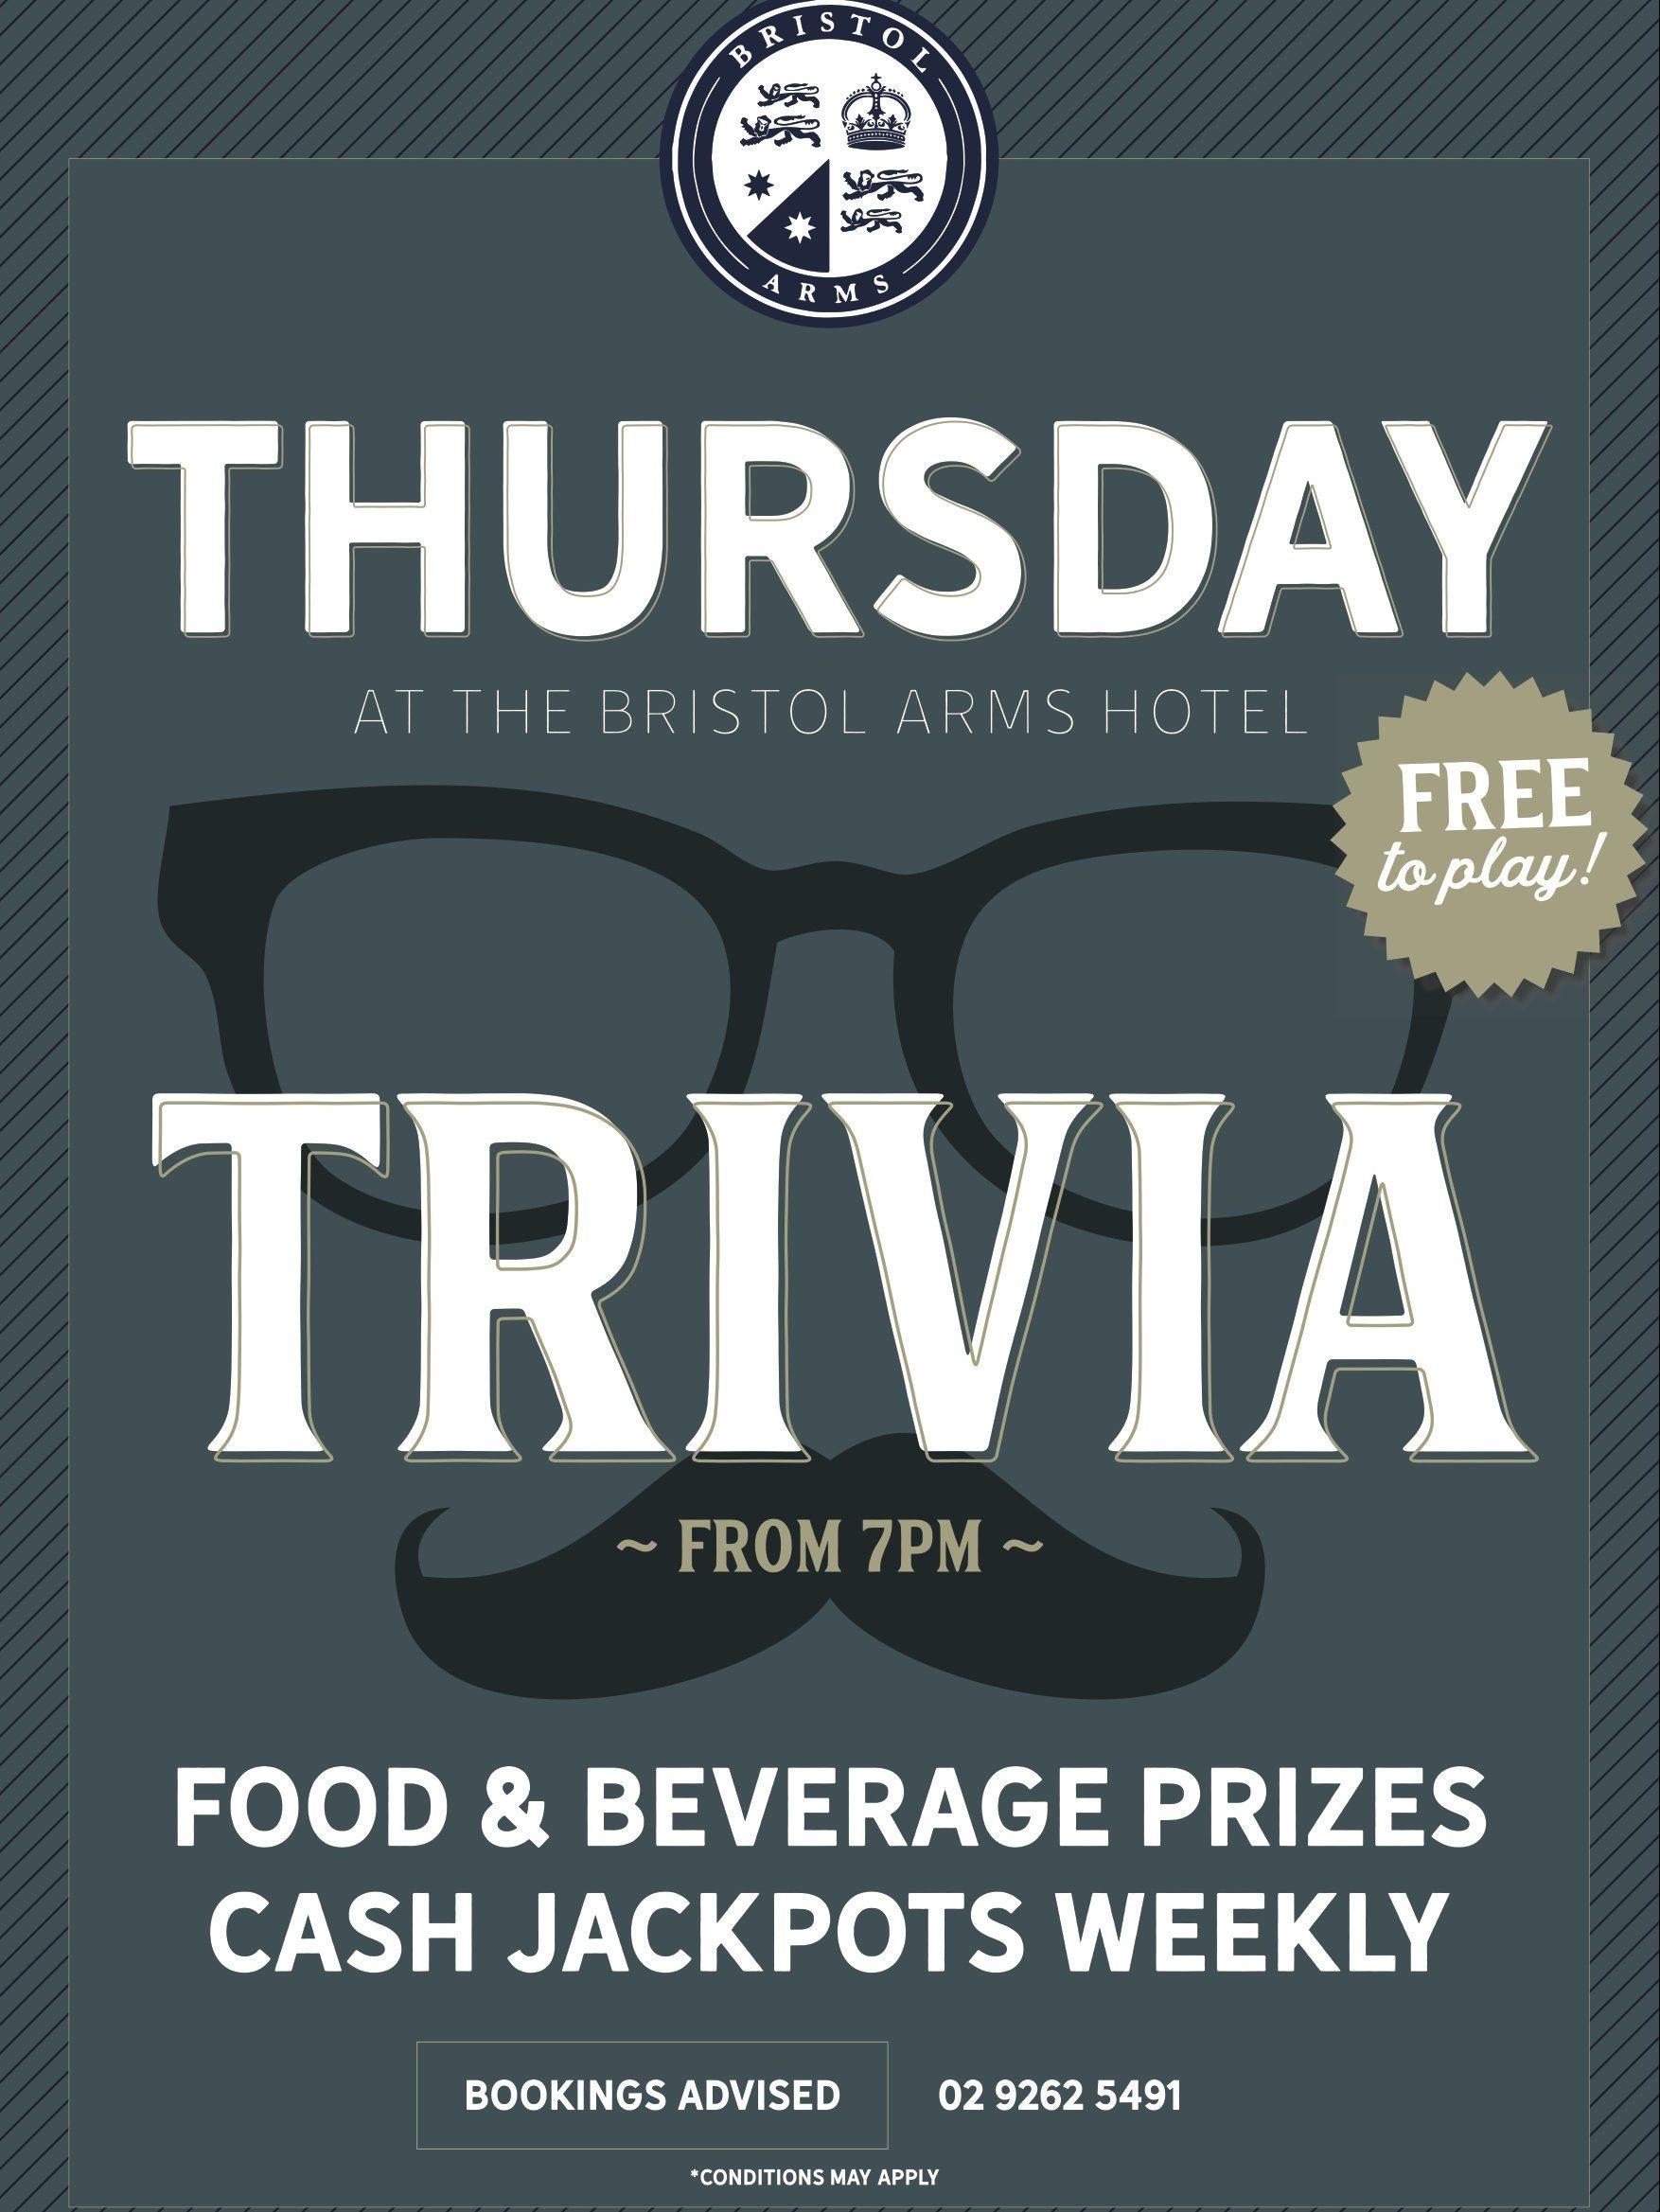 Trivia Thursdays